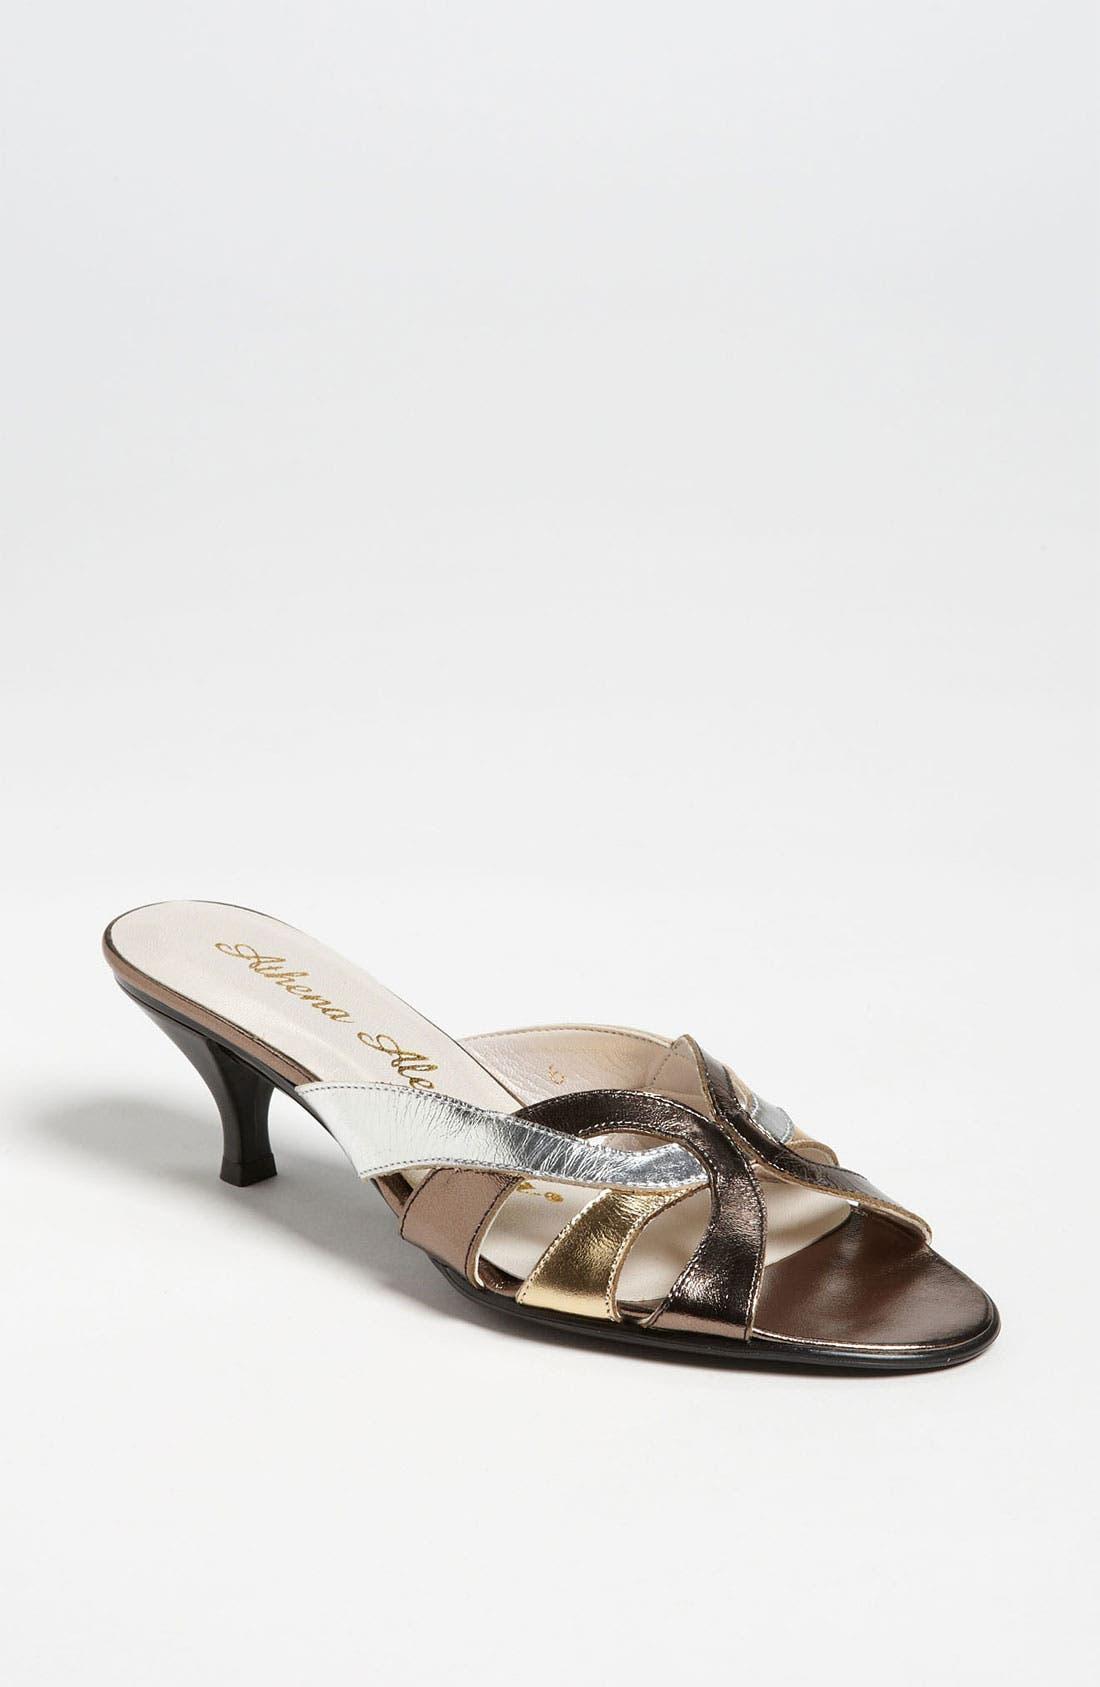 Alternate Image 1 Selected - Athena Alexander 'Lorinda' Sandal